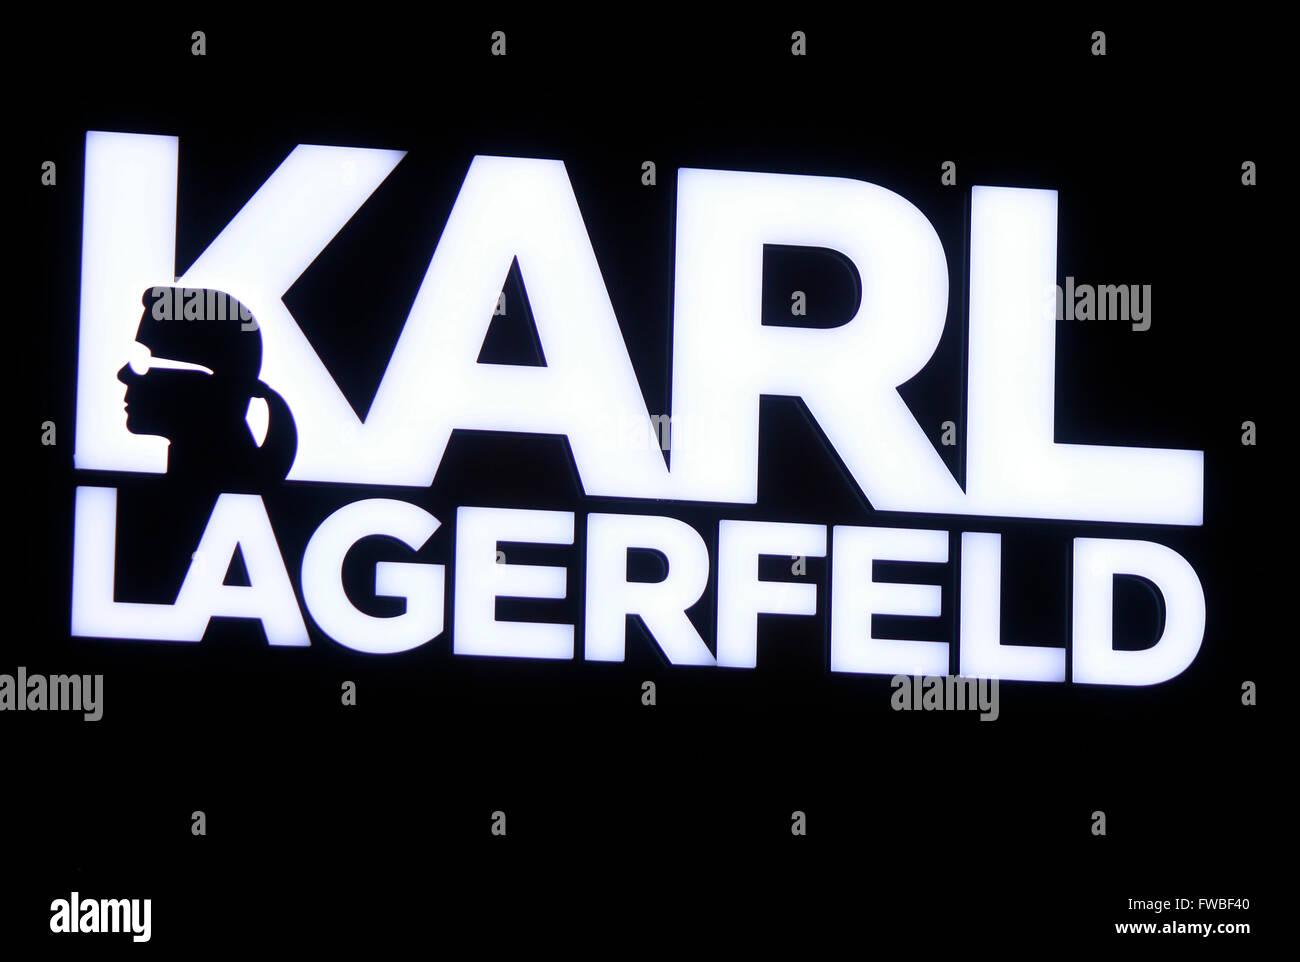 Karl Lagerfeld Logo Stock Photos Karl Lagerfeld Logo Stock Images